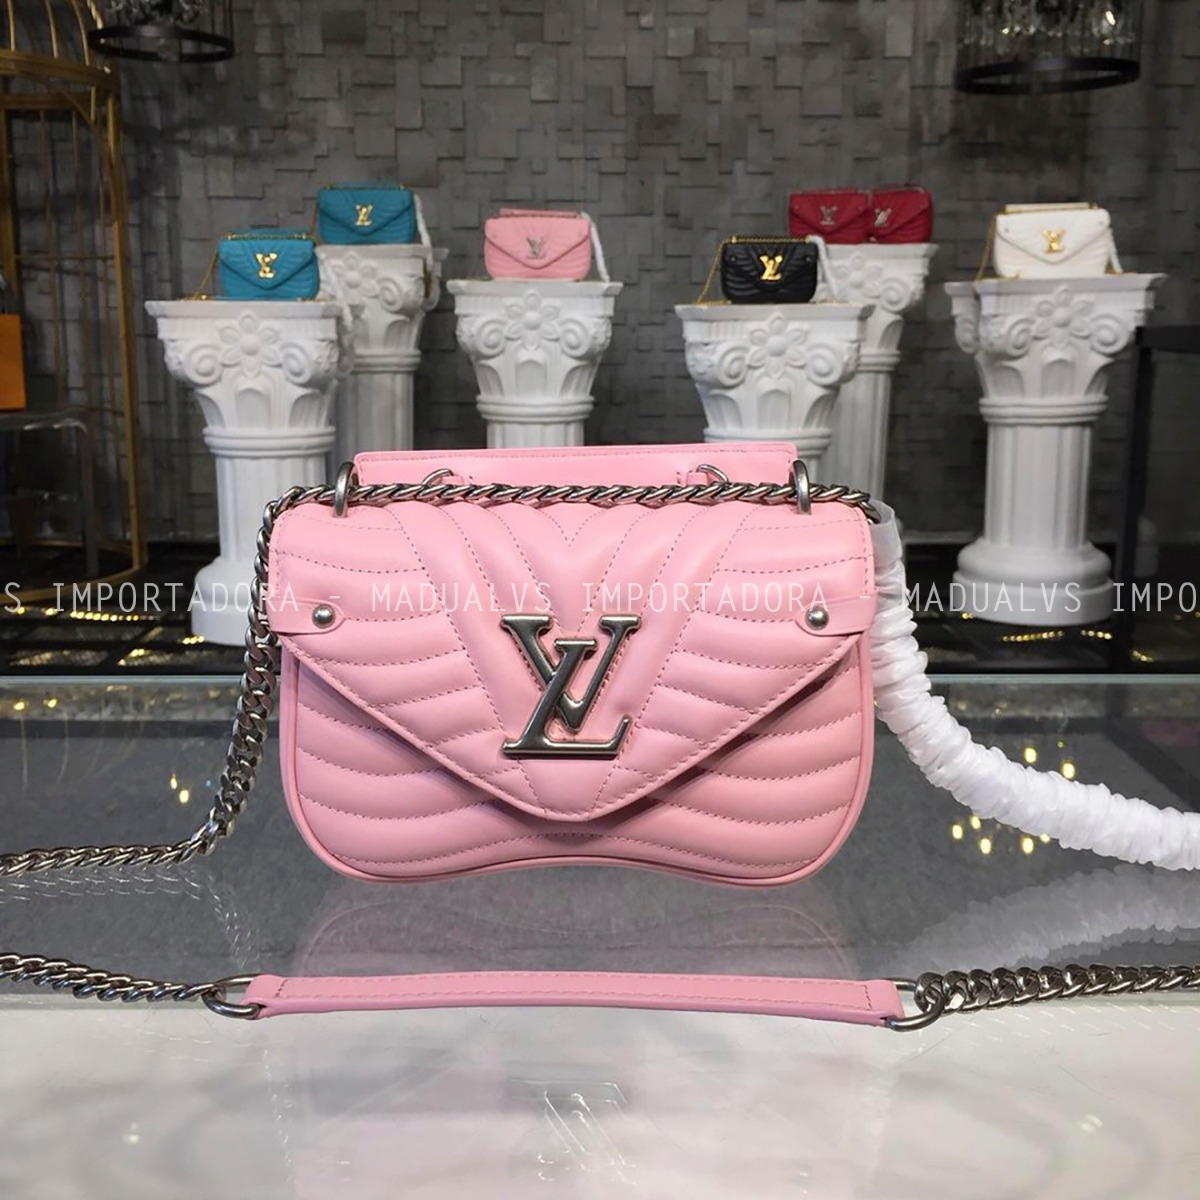 d5b0cf952 Bolsa Louis Vuitton New Wave Chain - Frete Grátis - R$ 1.190,00 em ...